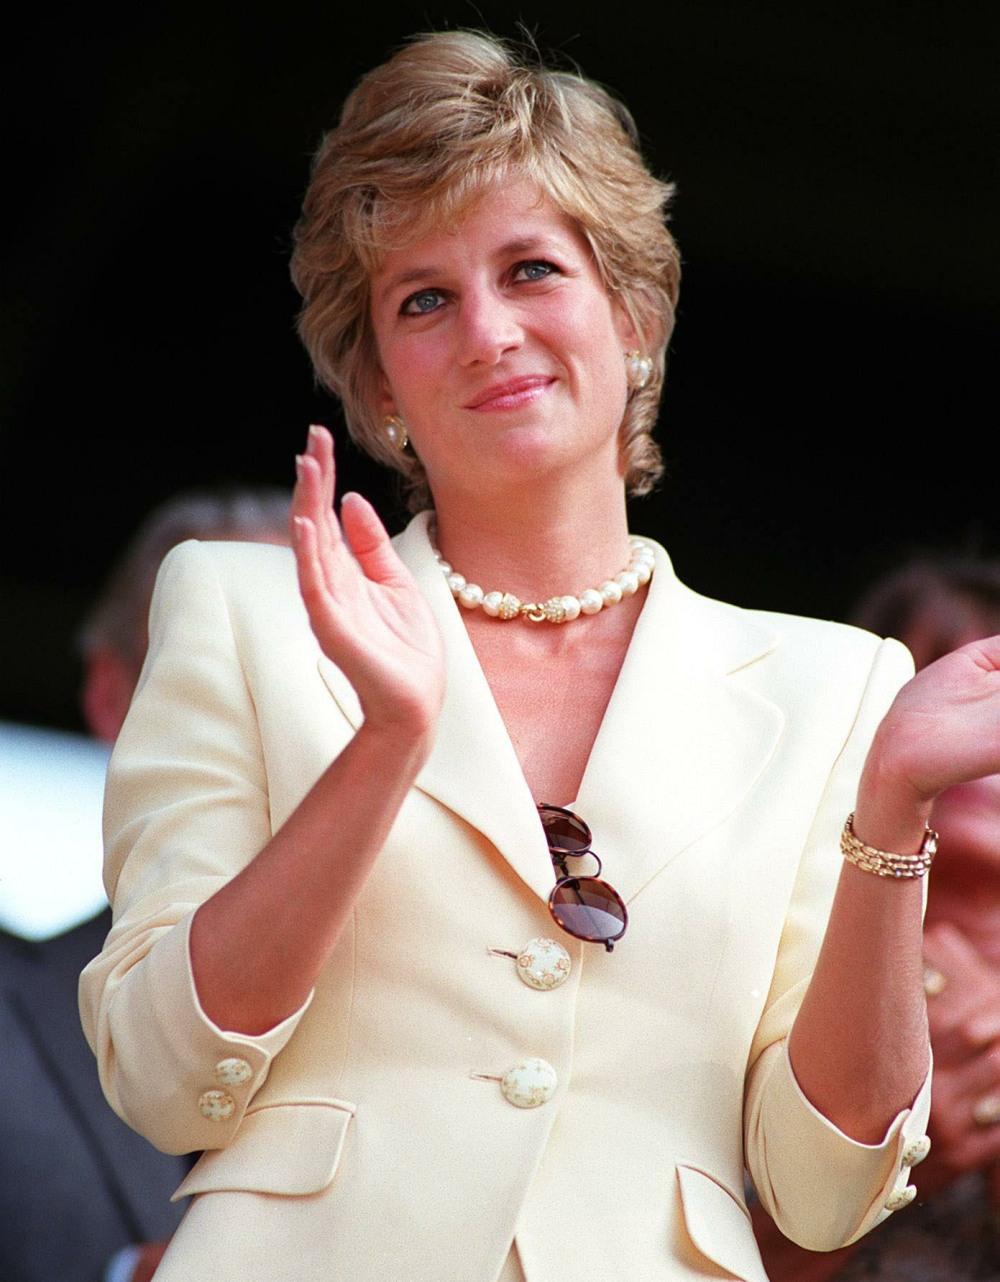 HRH PRINCESS OF WALES(HRH Princess Diana)Seen at the 1995 WimbledonTennis Championships.Bandphoto Agency PhotoB21 009812/E-36  09.07.1995